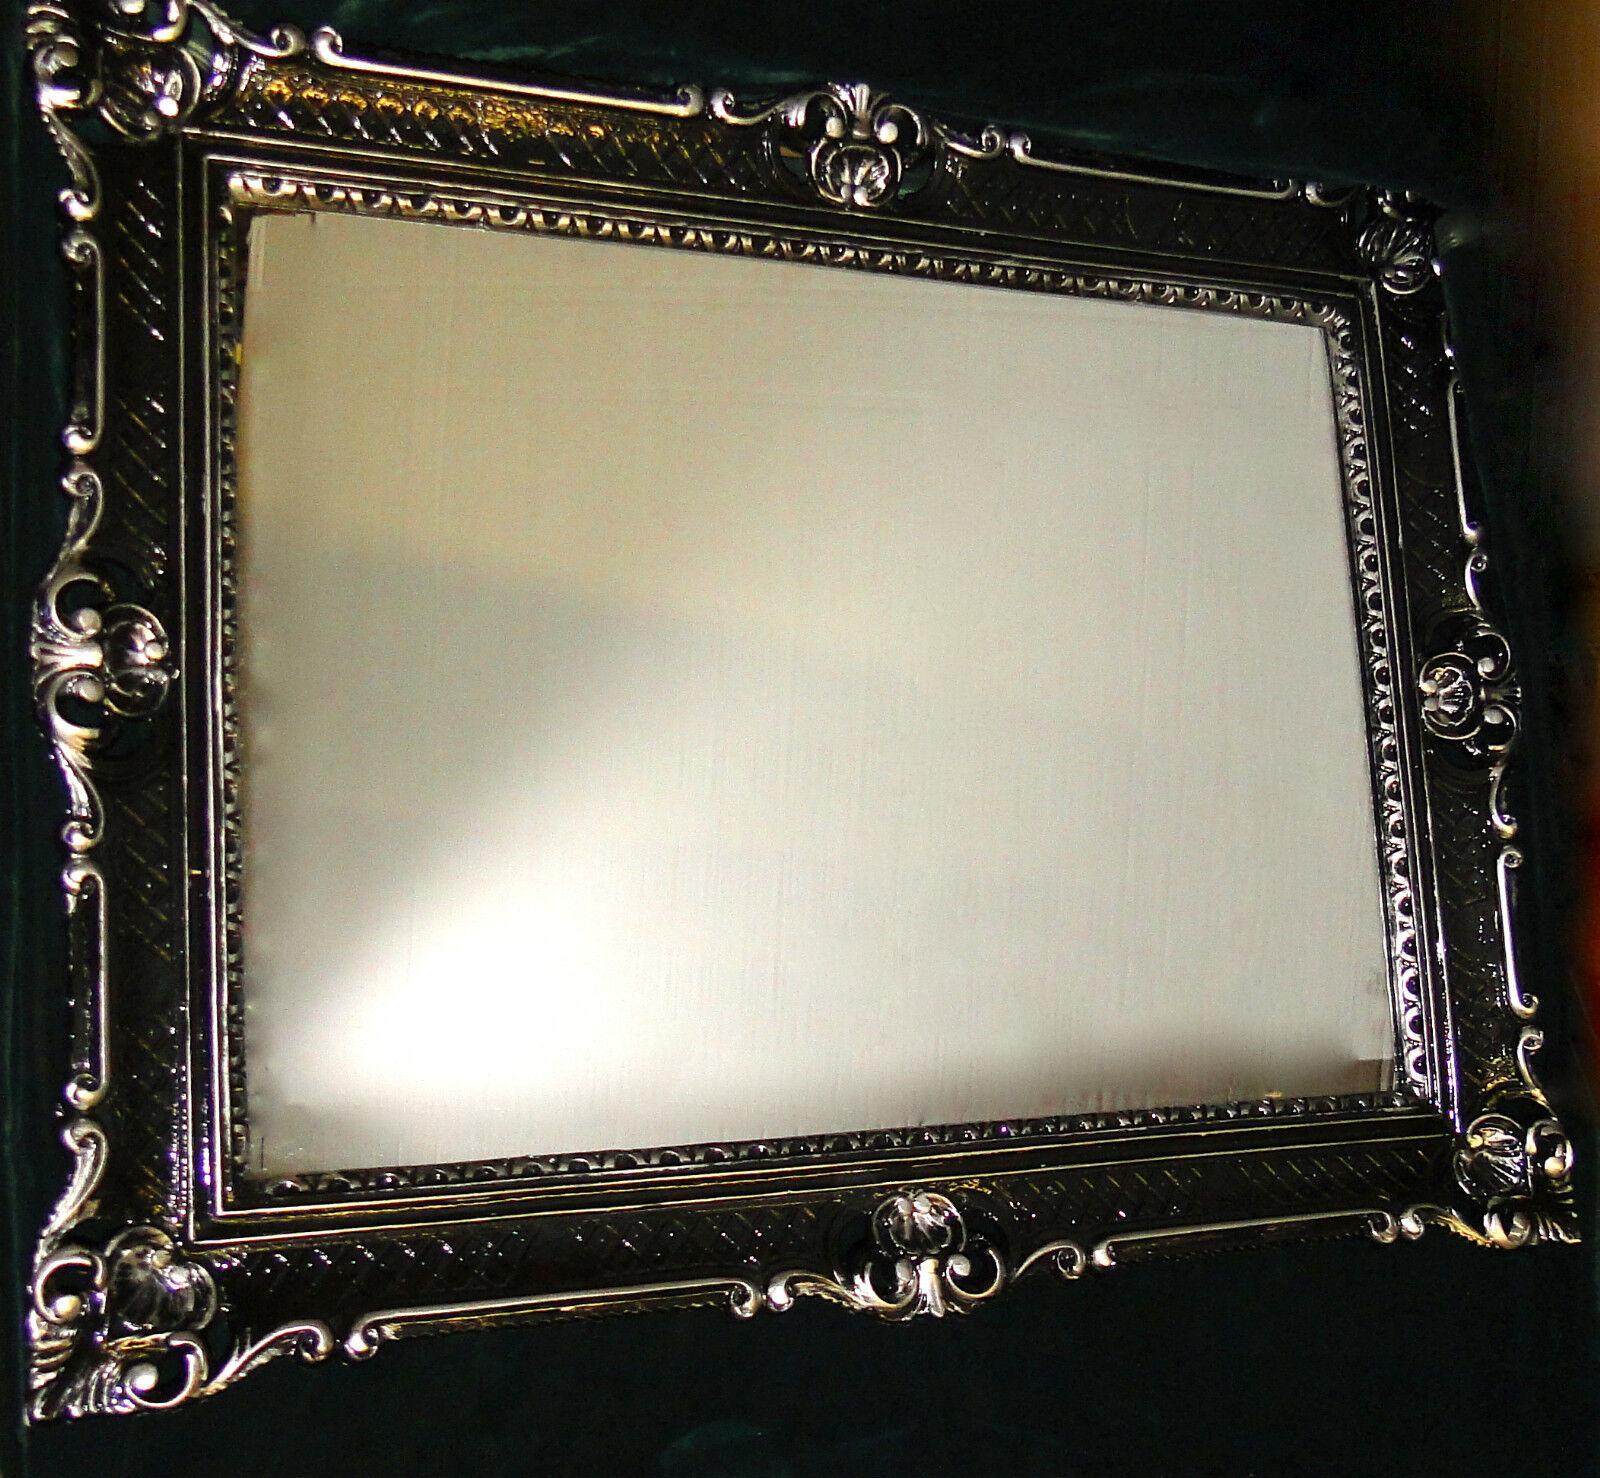 wandspiegel barock gro er spiegel schwarz silber hochglanz 90x70 rahmen antik ebay. Black Bedroom Furniture Sets. Home Design Ideas